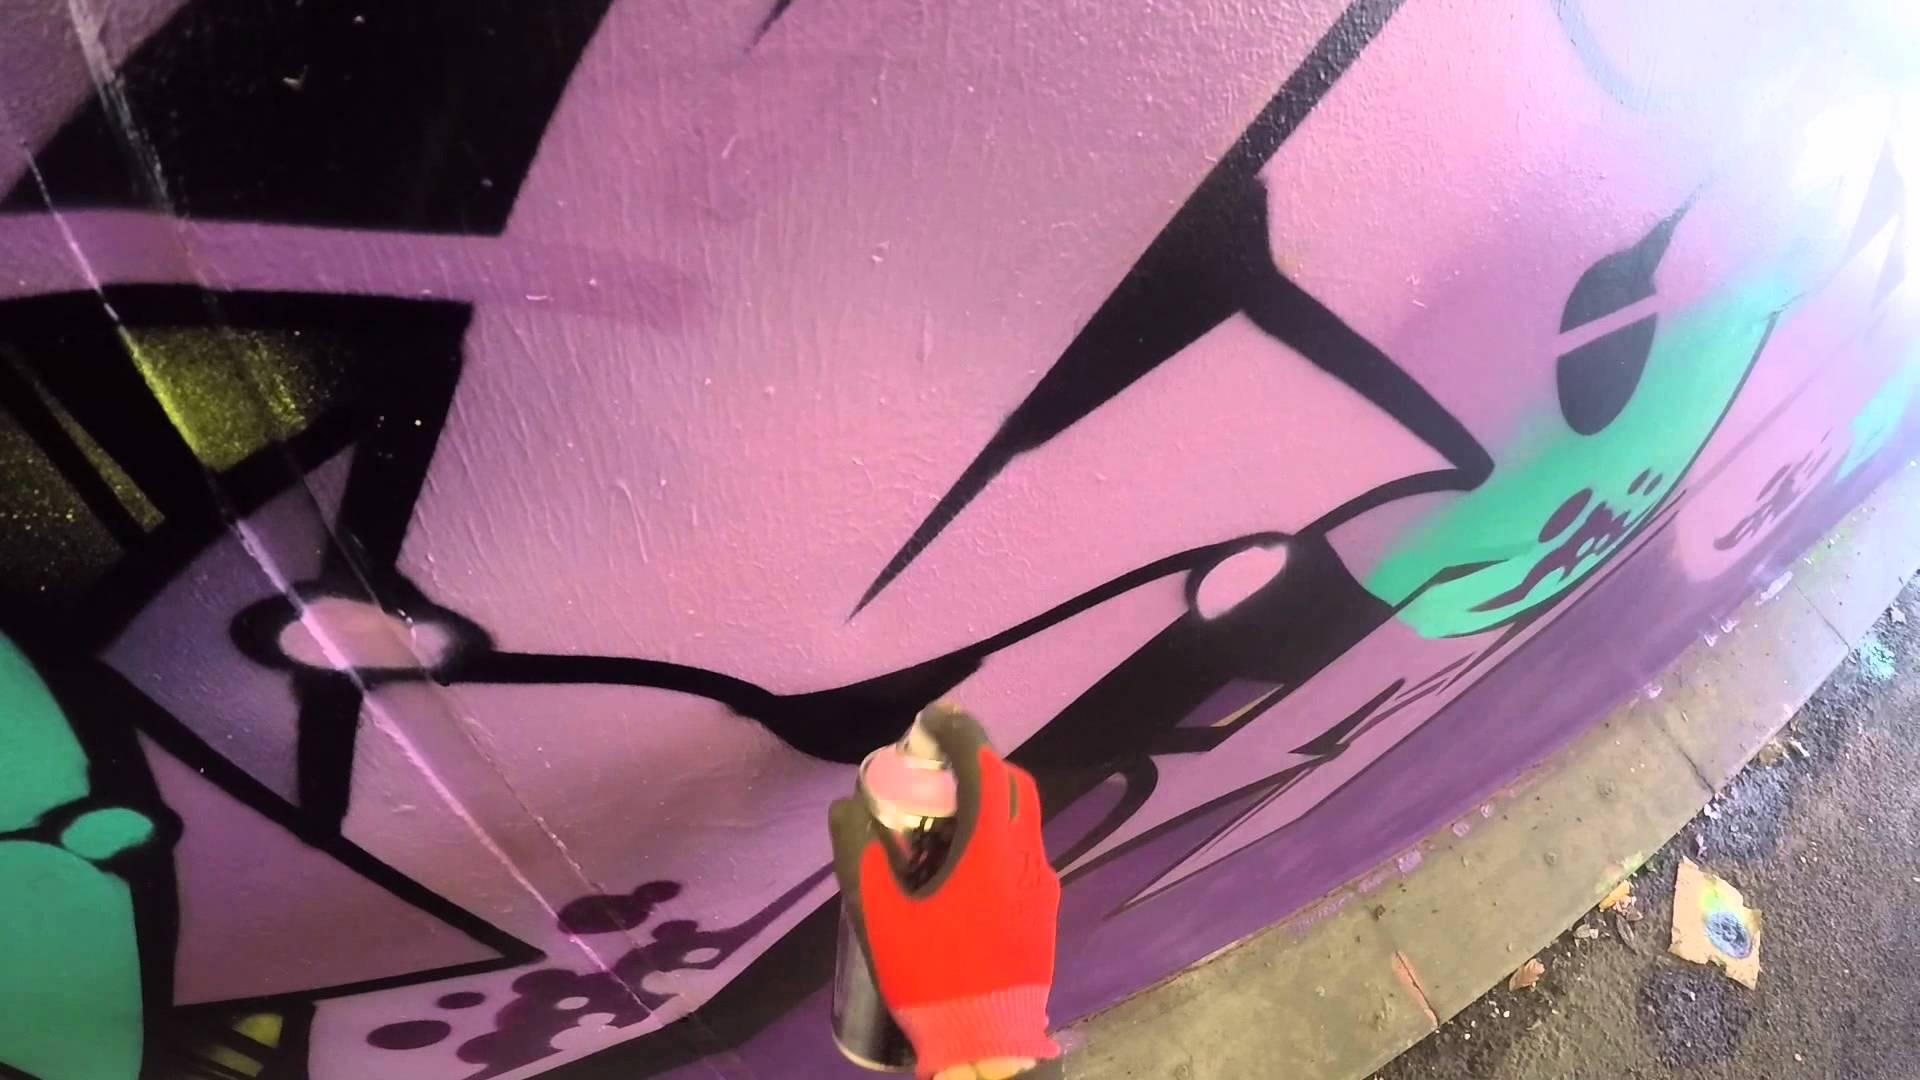 #Graffiti – Ghost, Osek, Zem, & Deets EA Crew